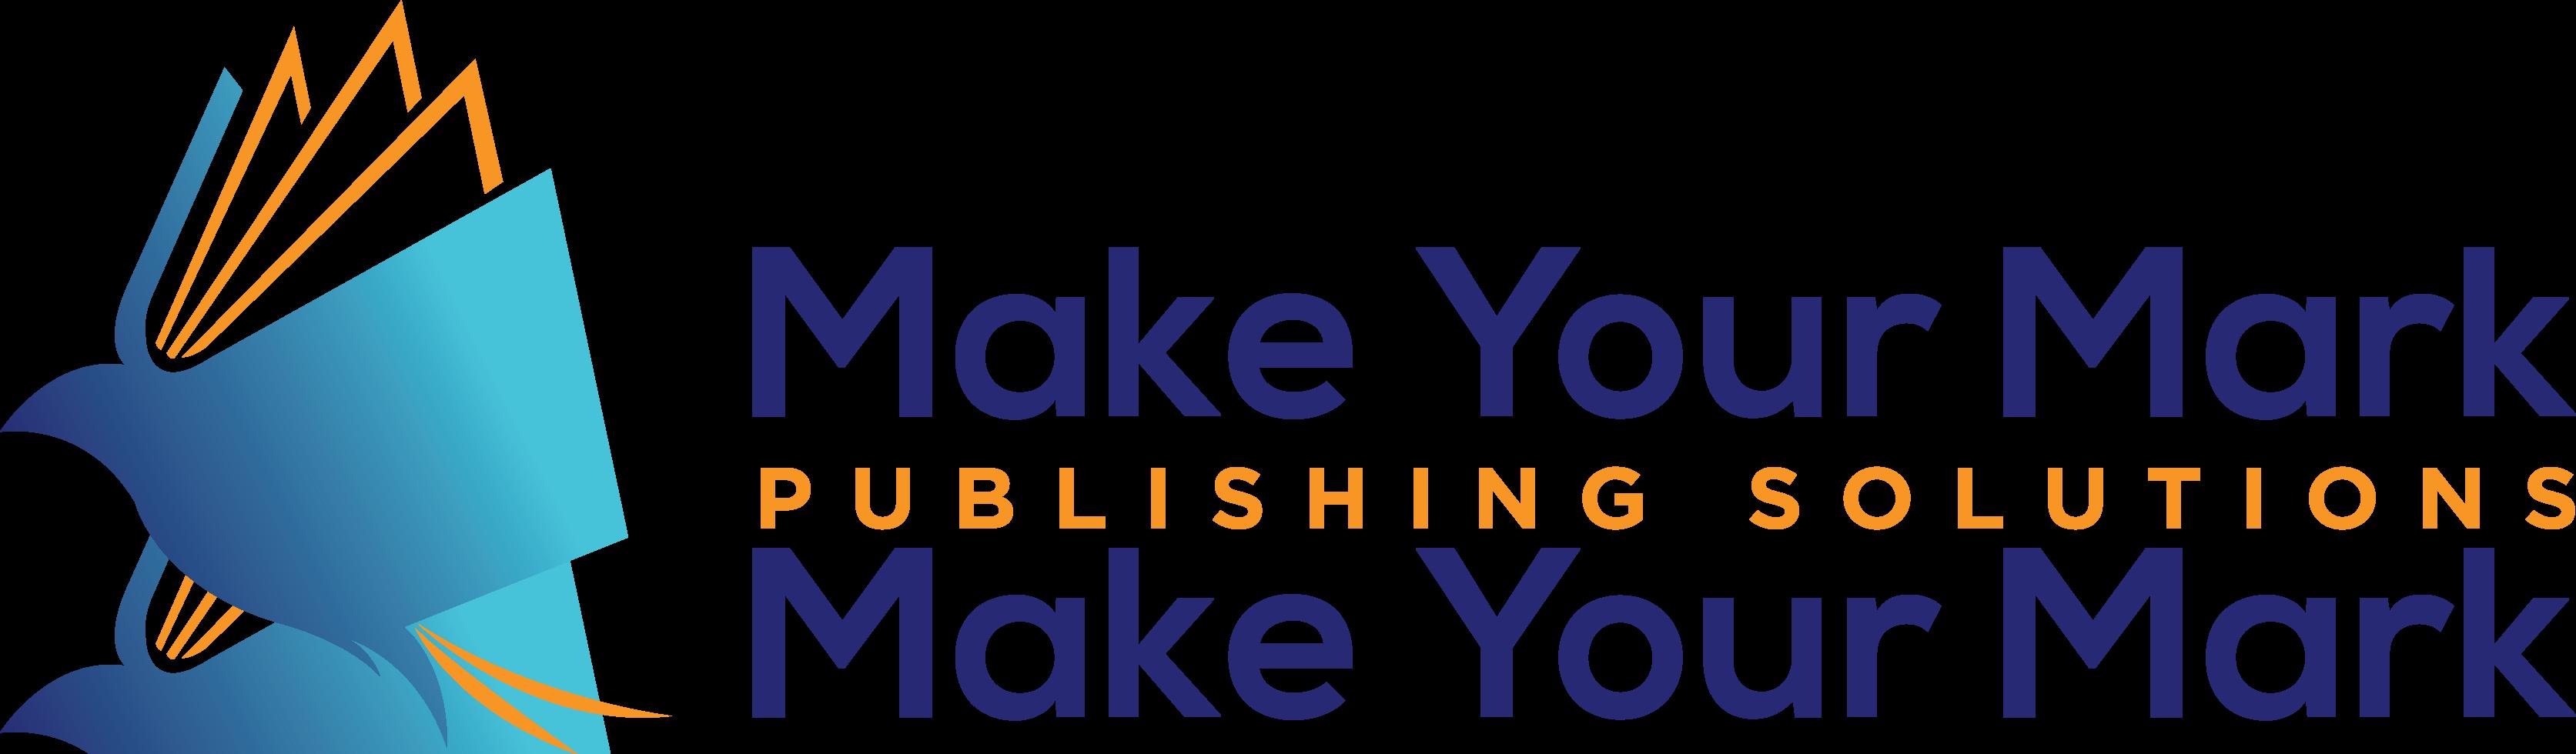 Create a Logo for a Publishing Company that Symbolizes Freedom & Creativity